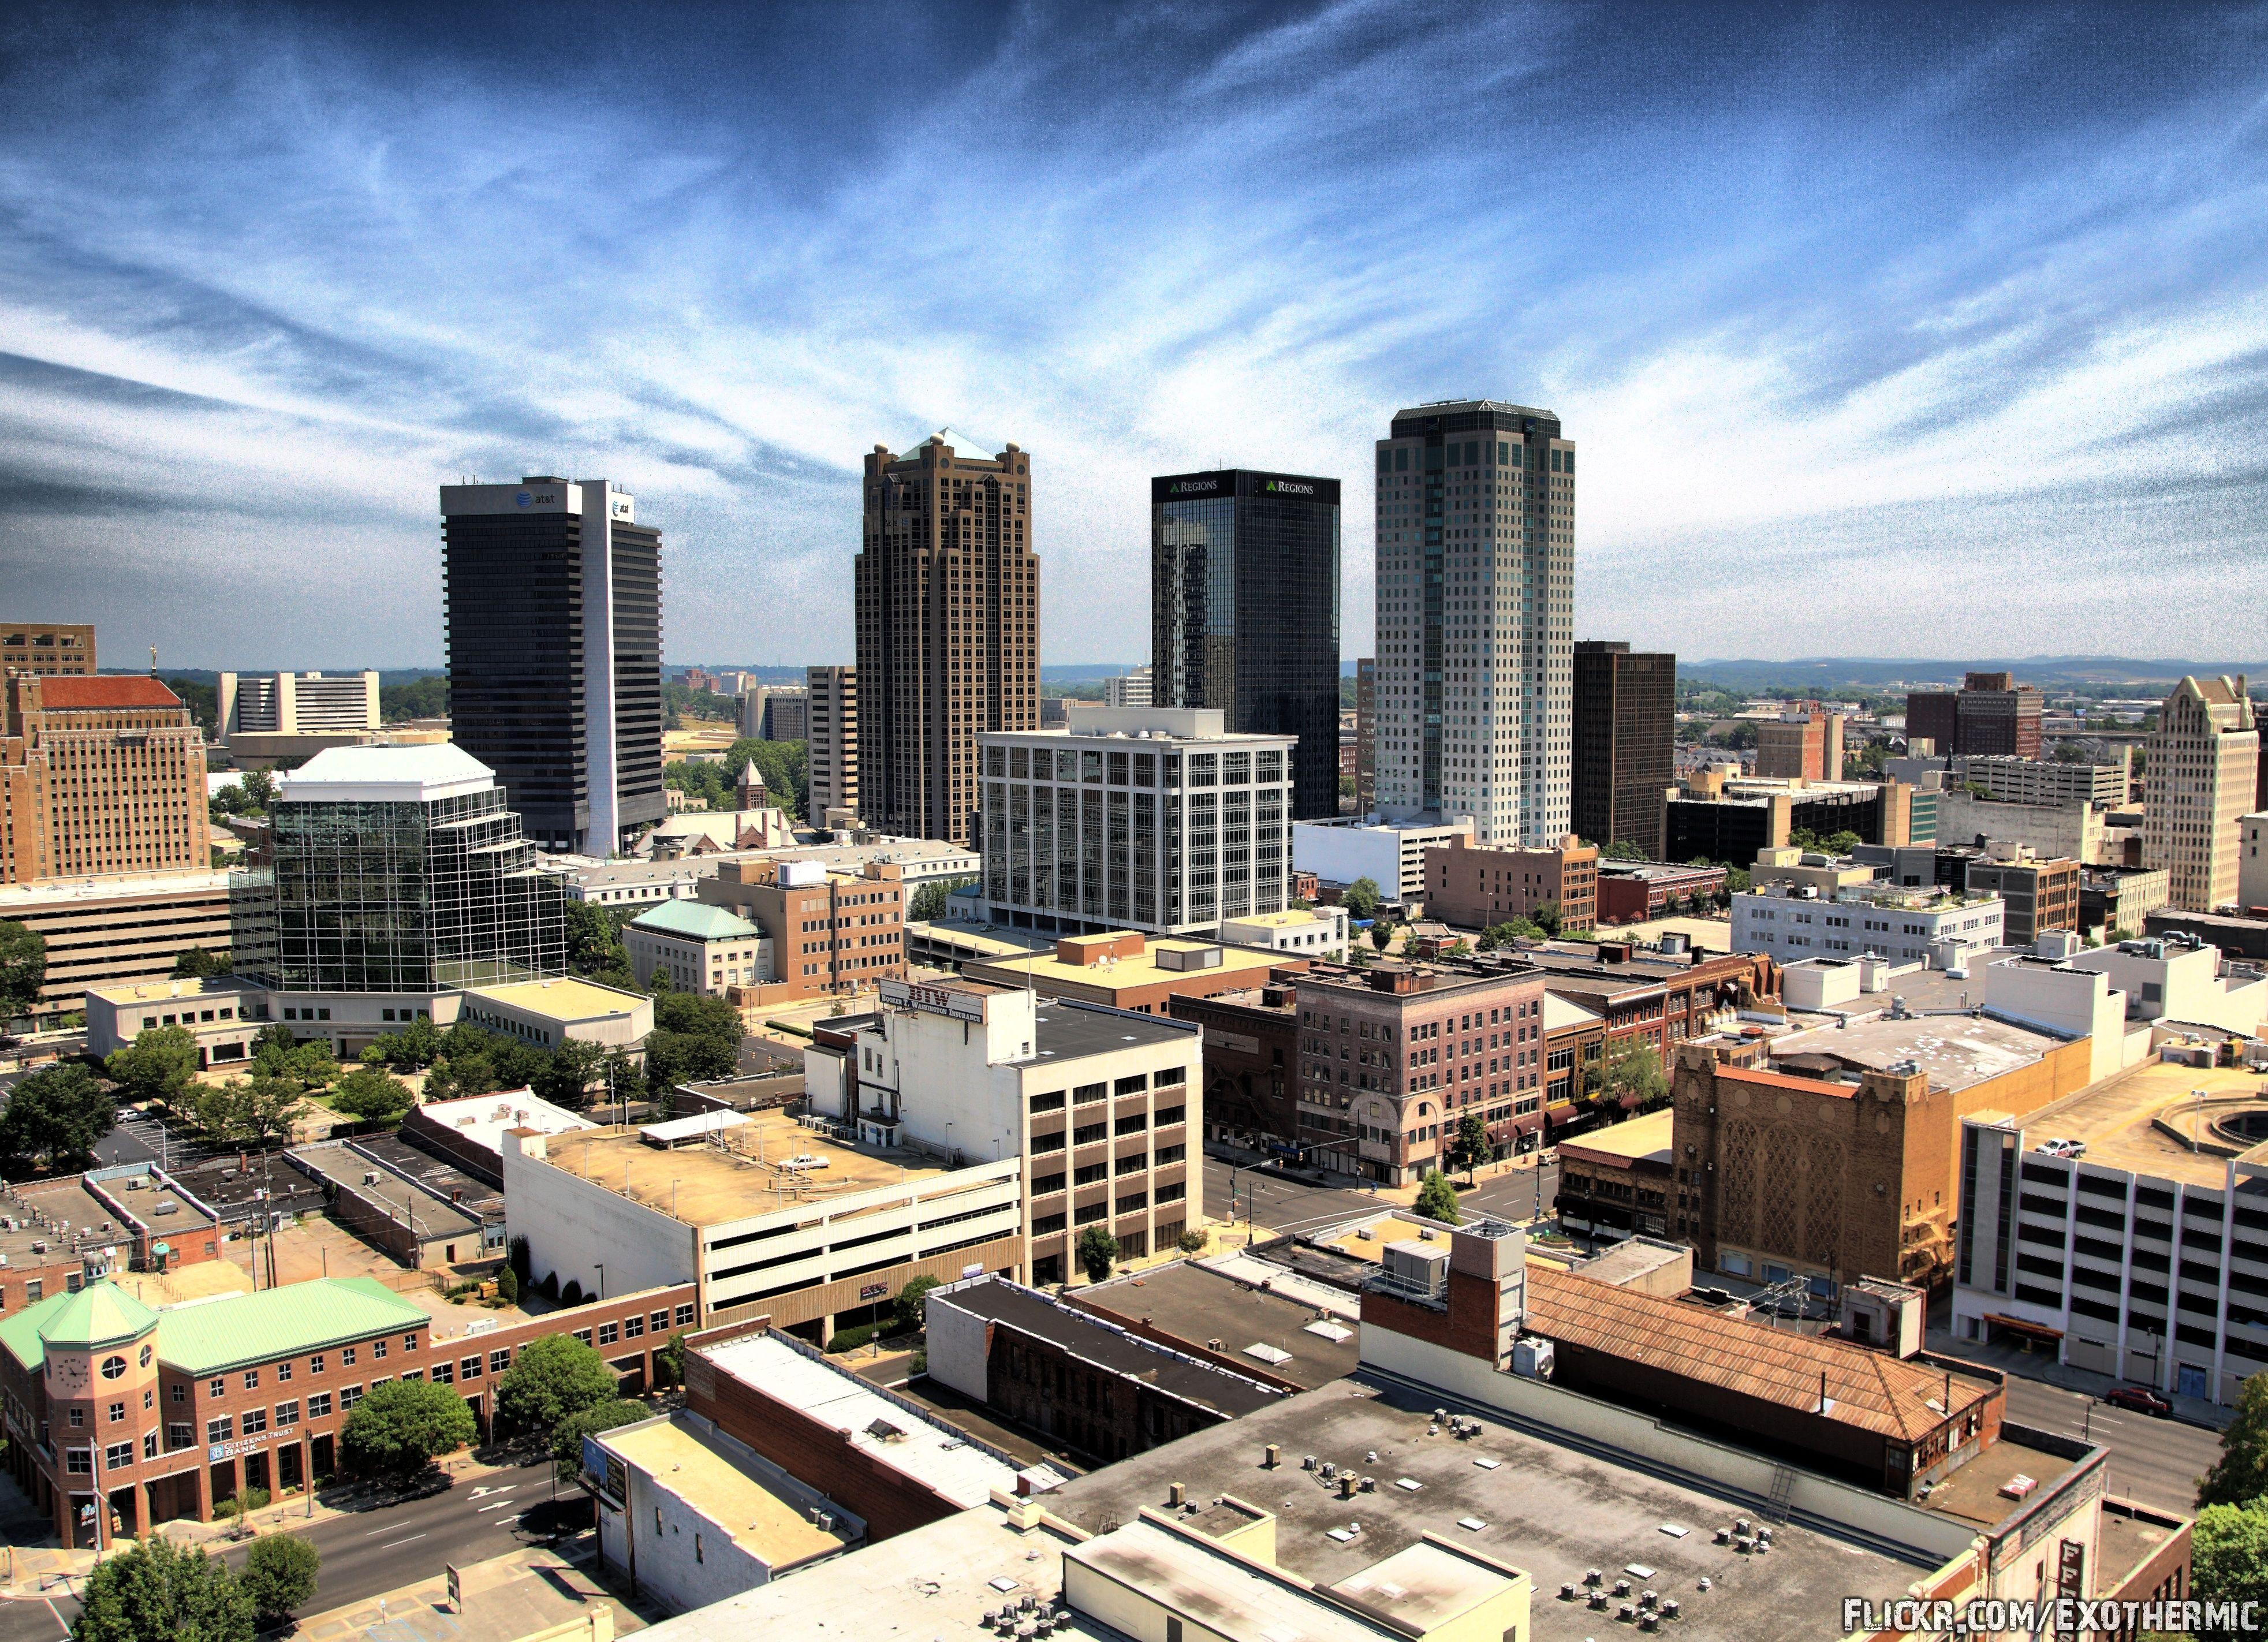 Birmingham skyline photo